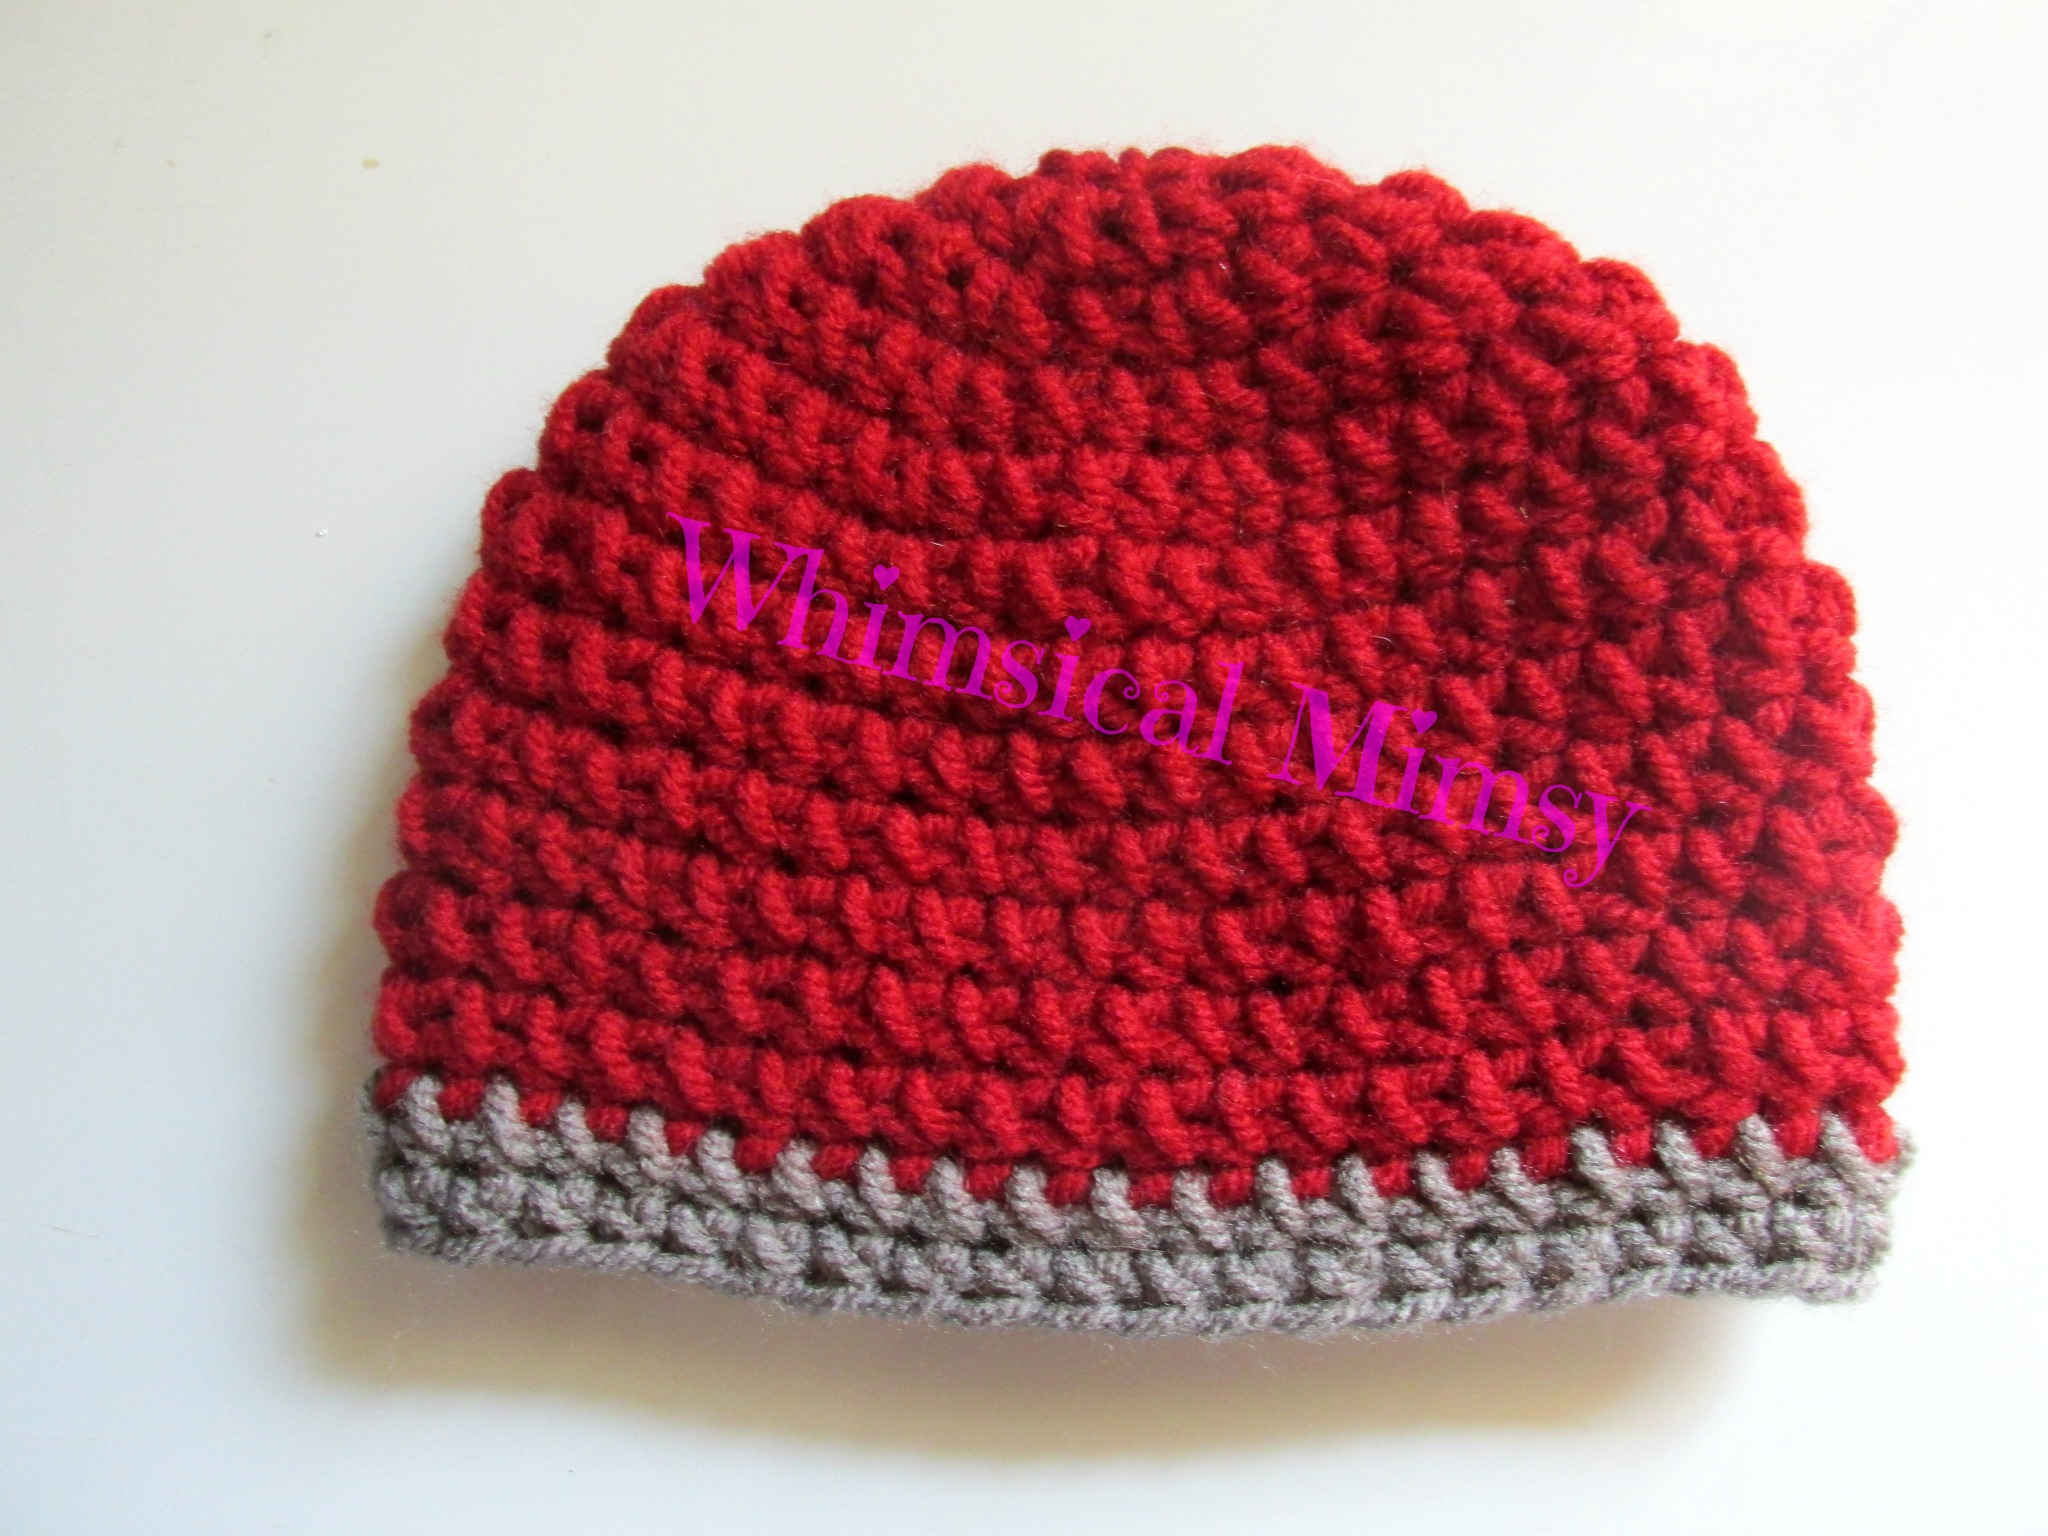 9656d10f915 ... Crochet Alabama Football Inspired Newborn Hat and Diaper Cover Set  Photo Prop - Thumbnail 4